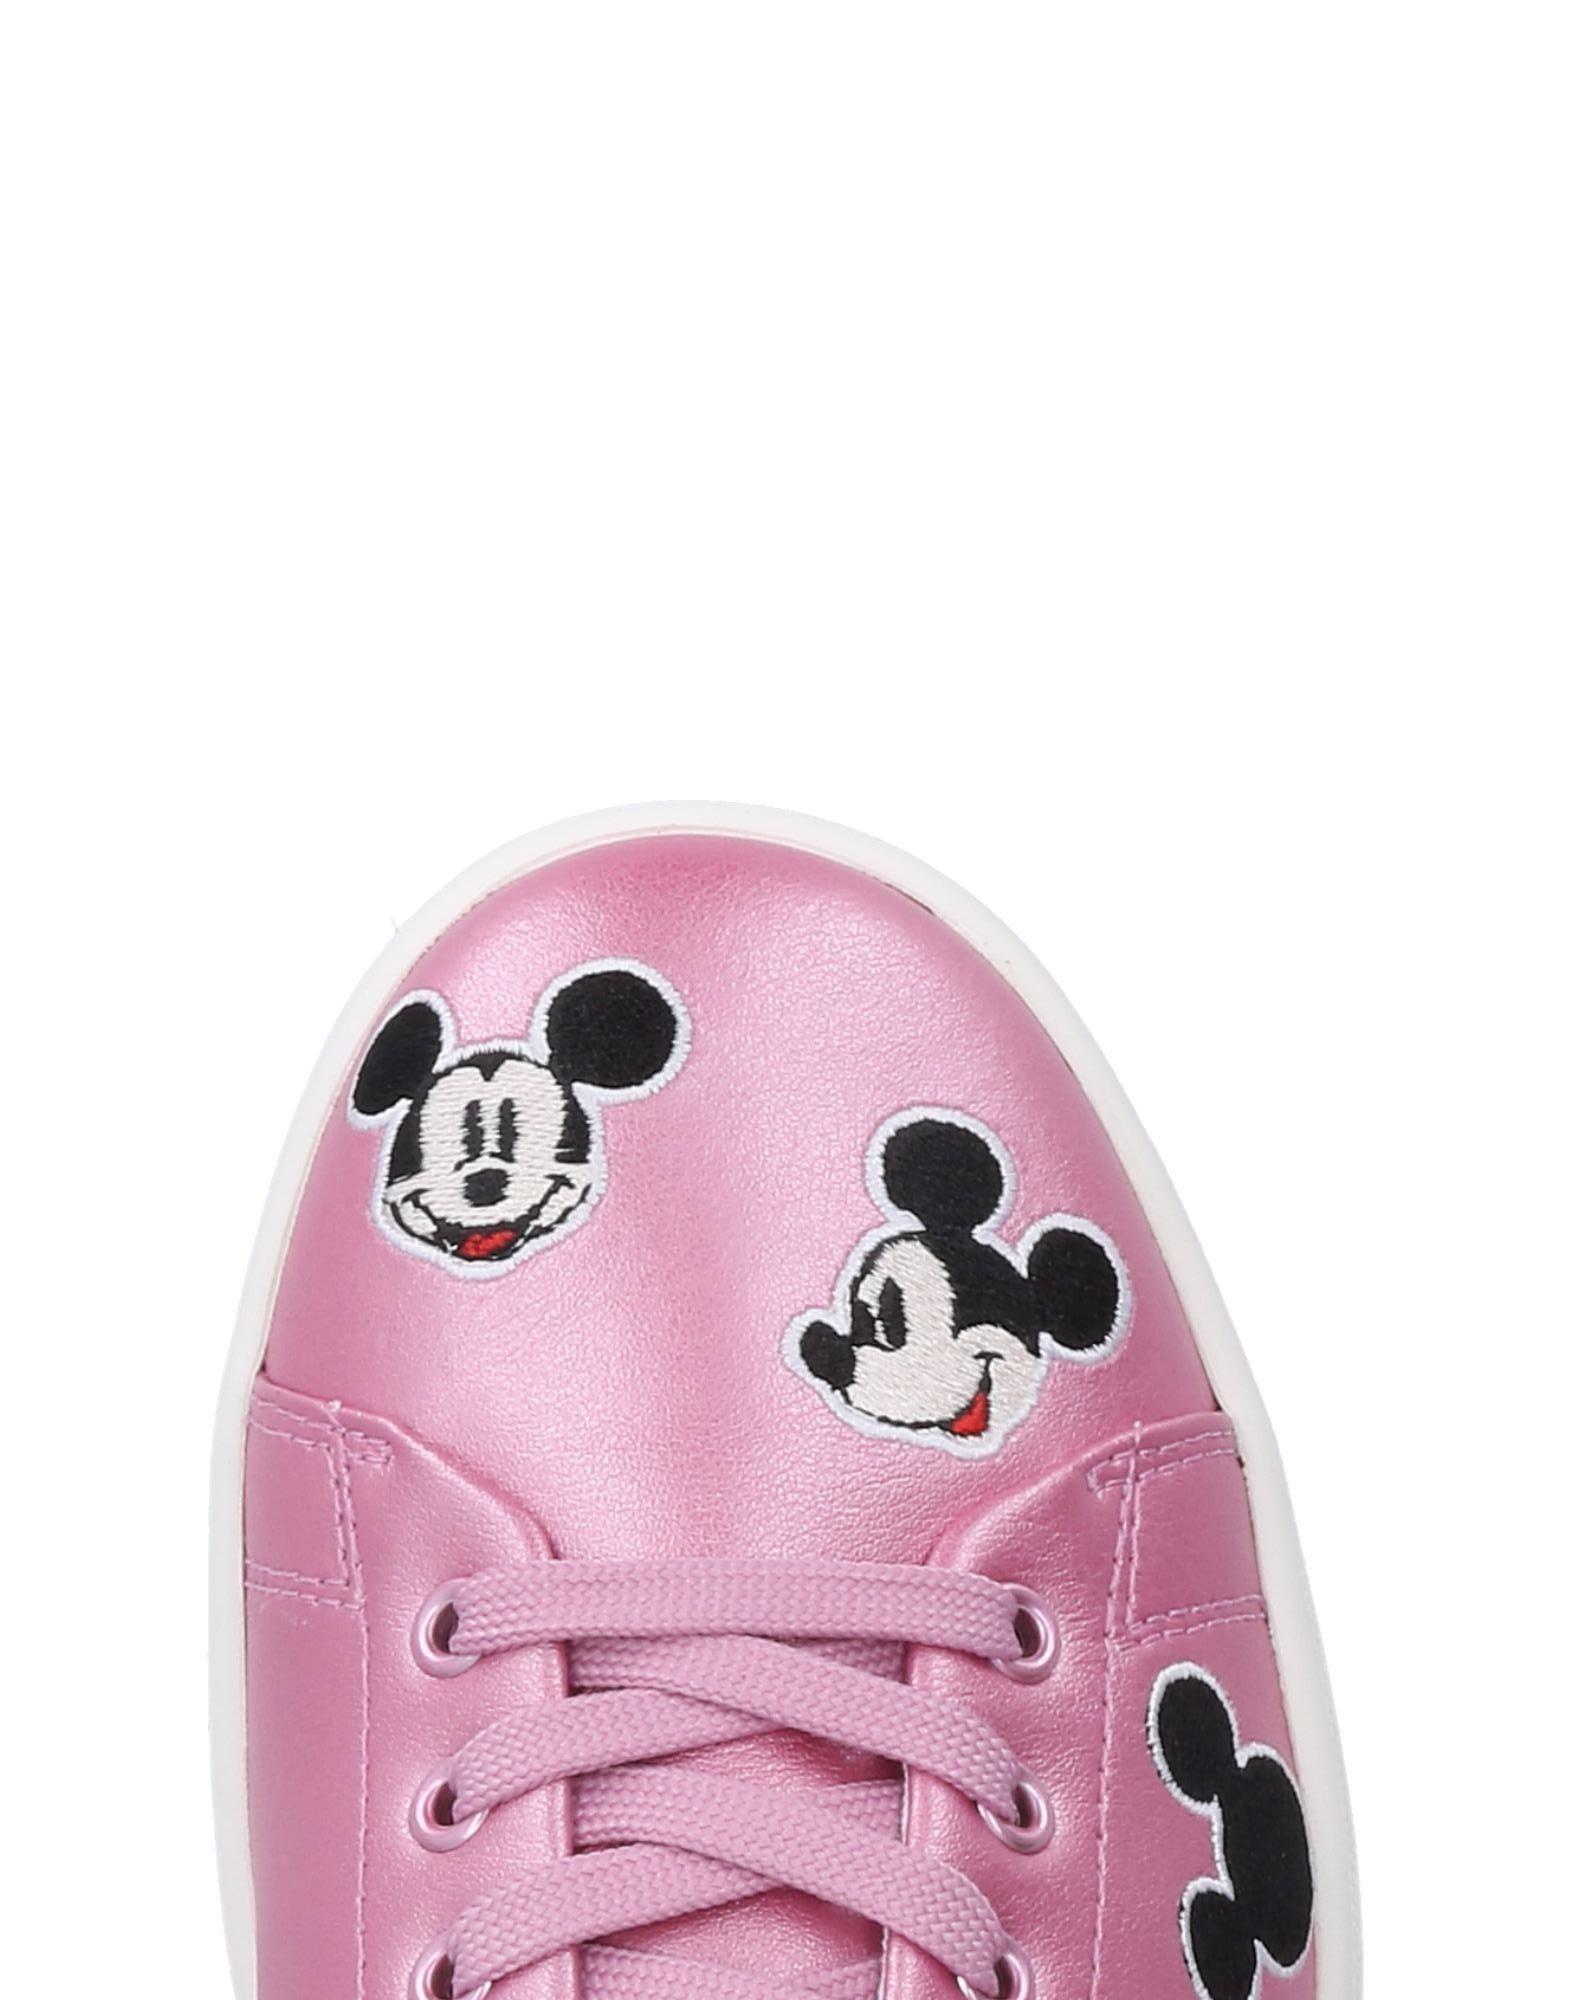 Moa Master Of Arts Sneakers Herren  11512307SN 11512307SN  Heiße Schuhe c0e5f7